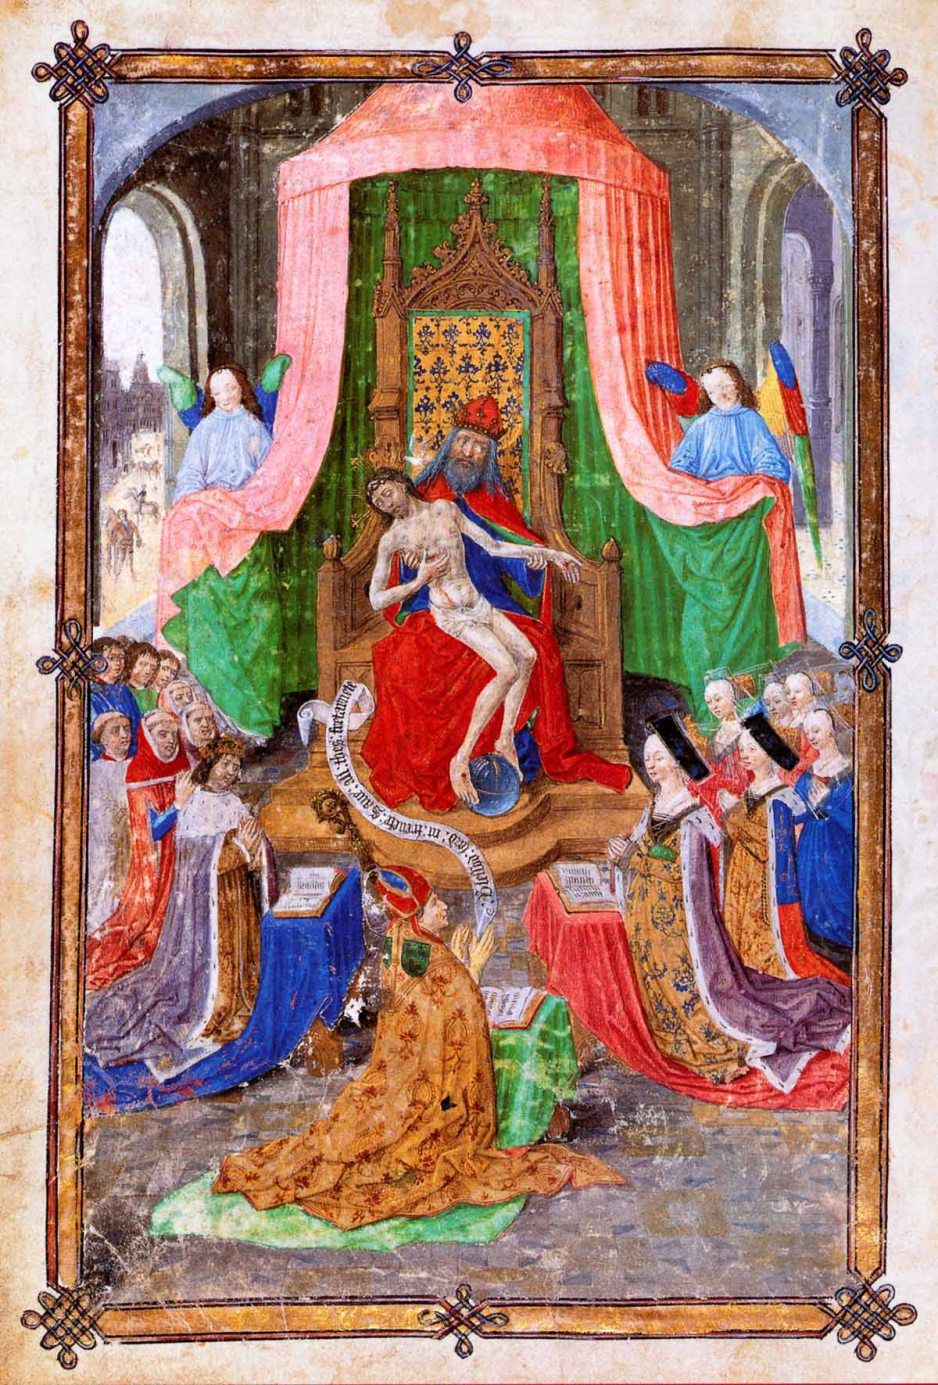 The Luton Guild Book. Frontspiece, circa 1475.